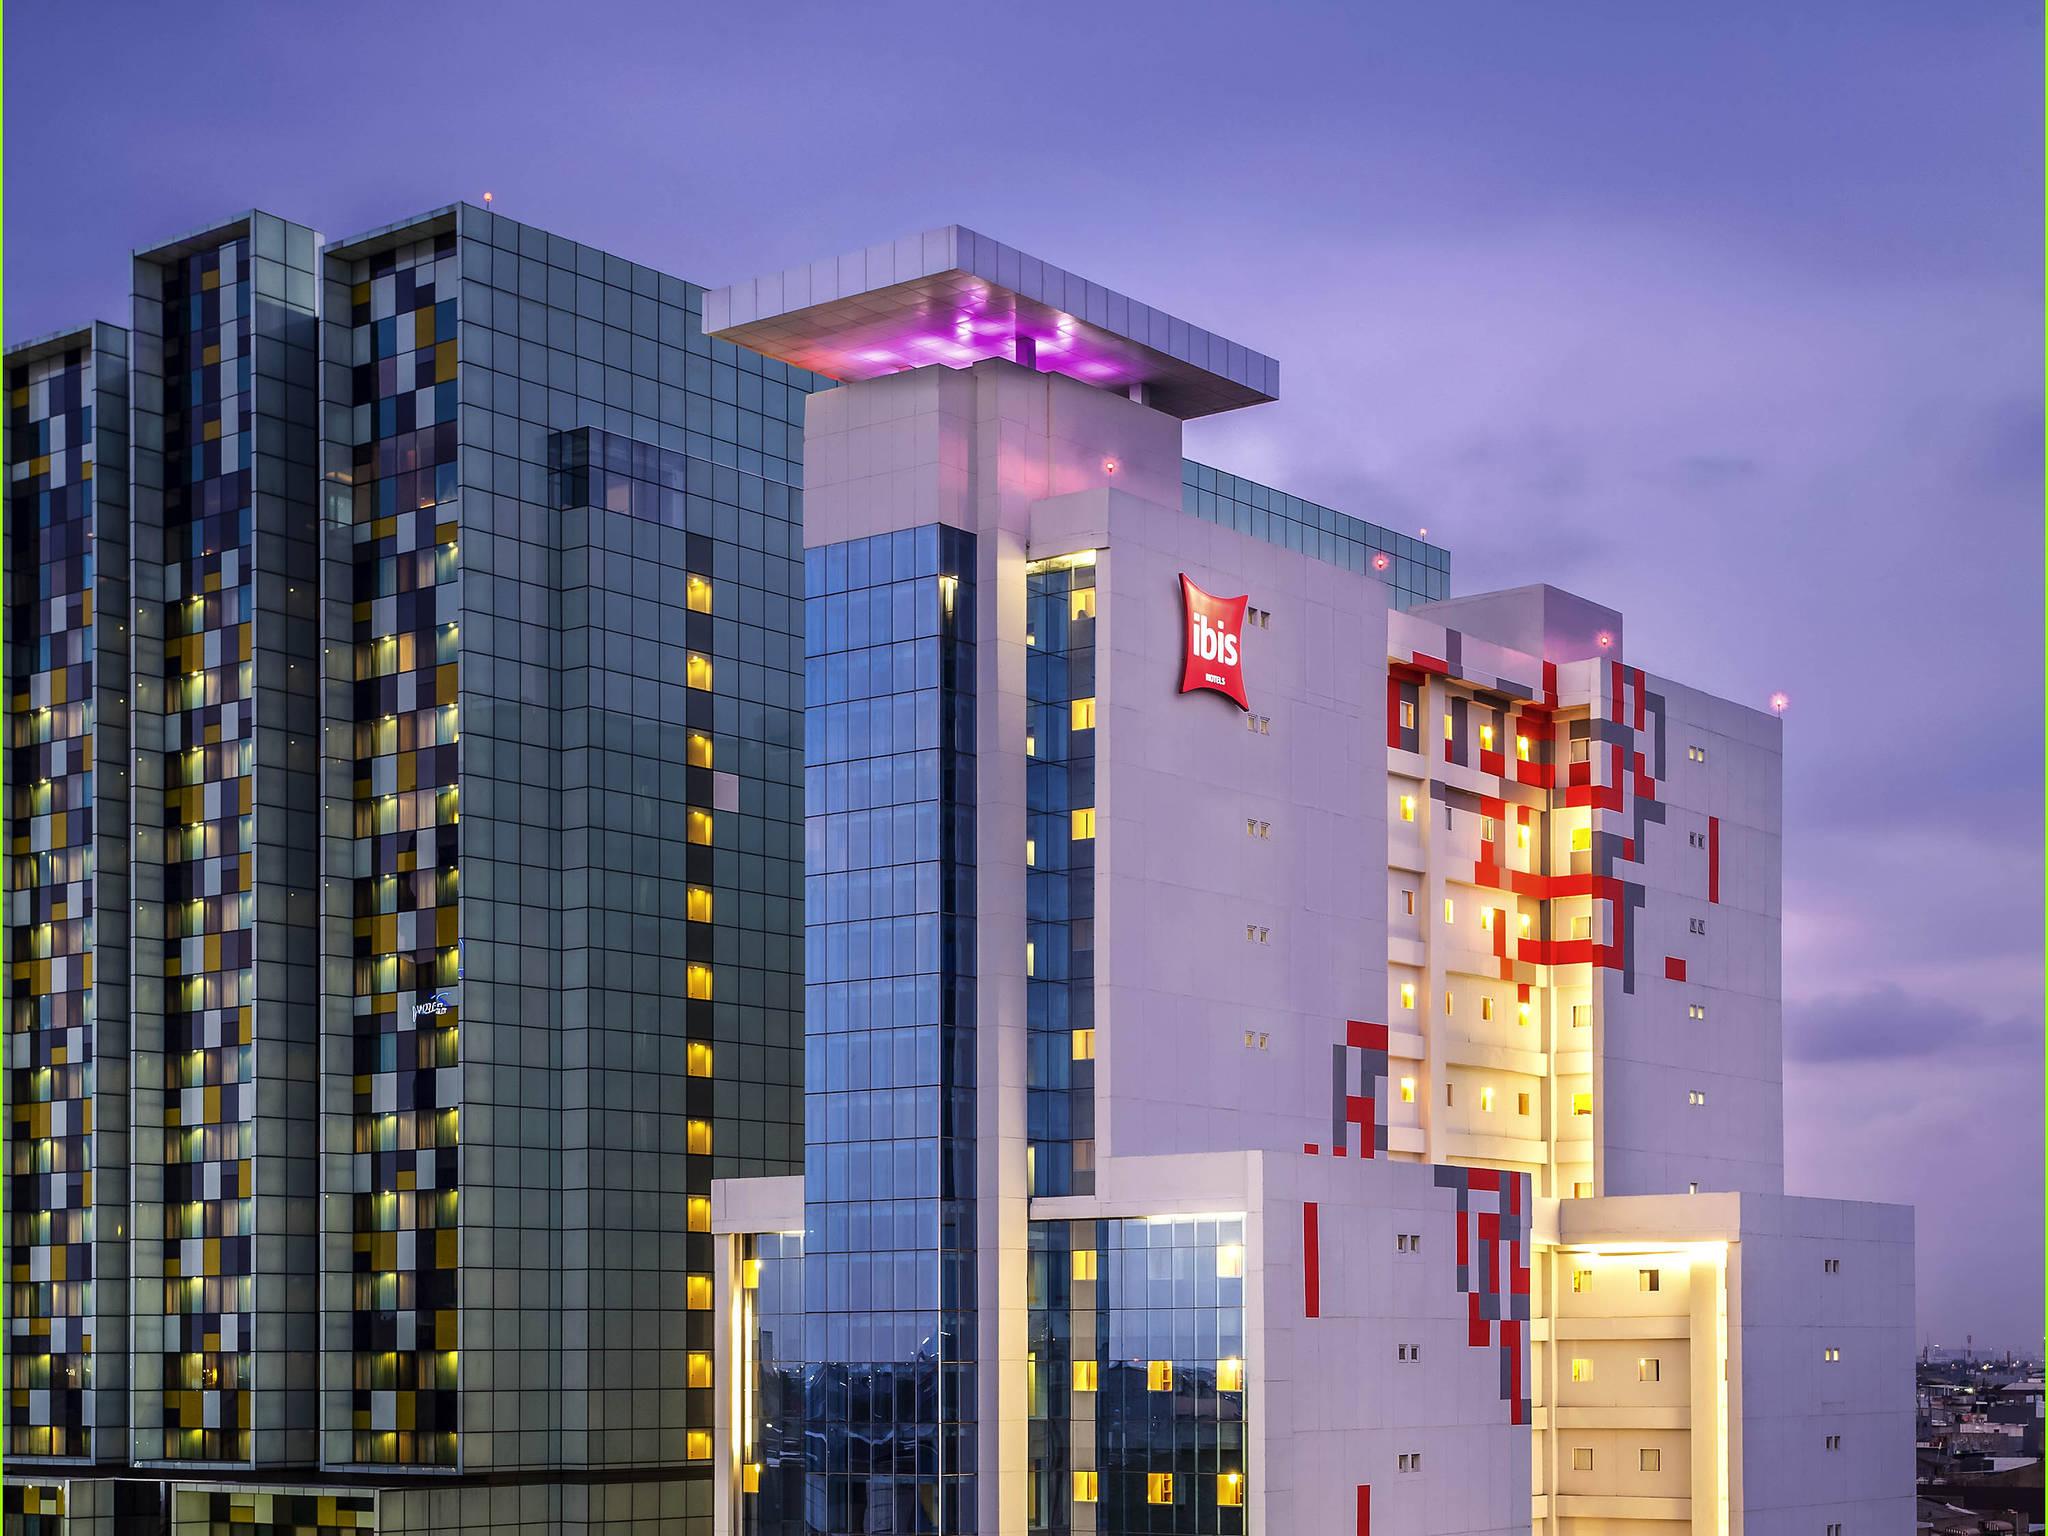 Hotel Jakarta Ibis Harmoni Dunia Air Ancpl Kota Administrasi Utara